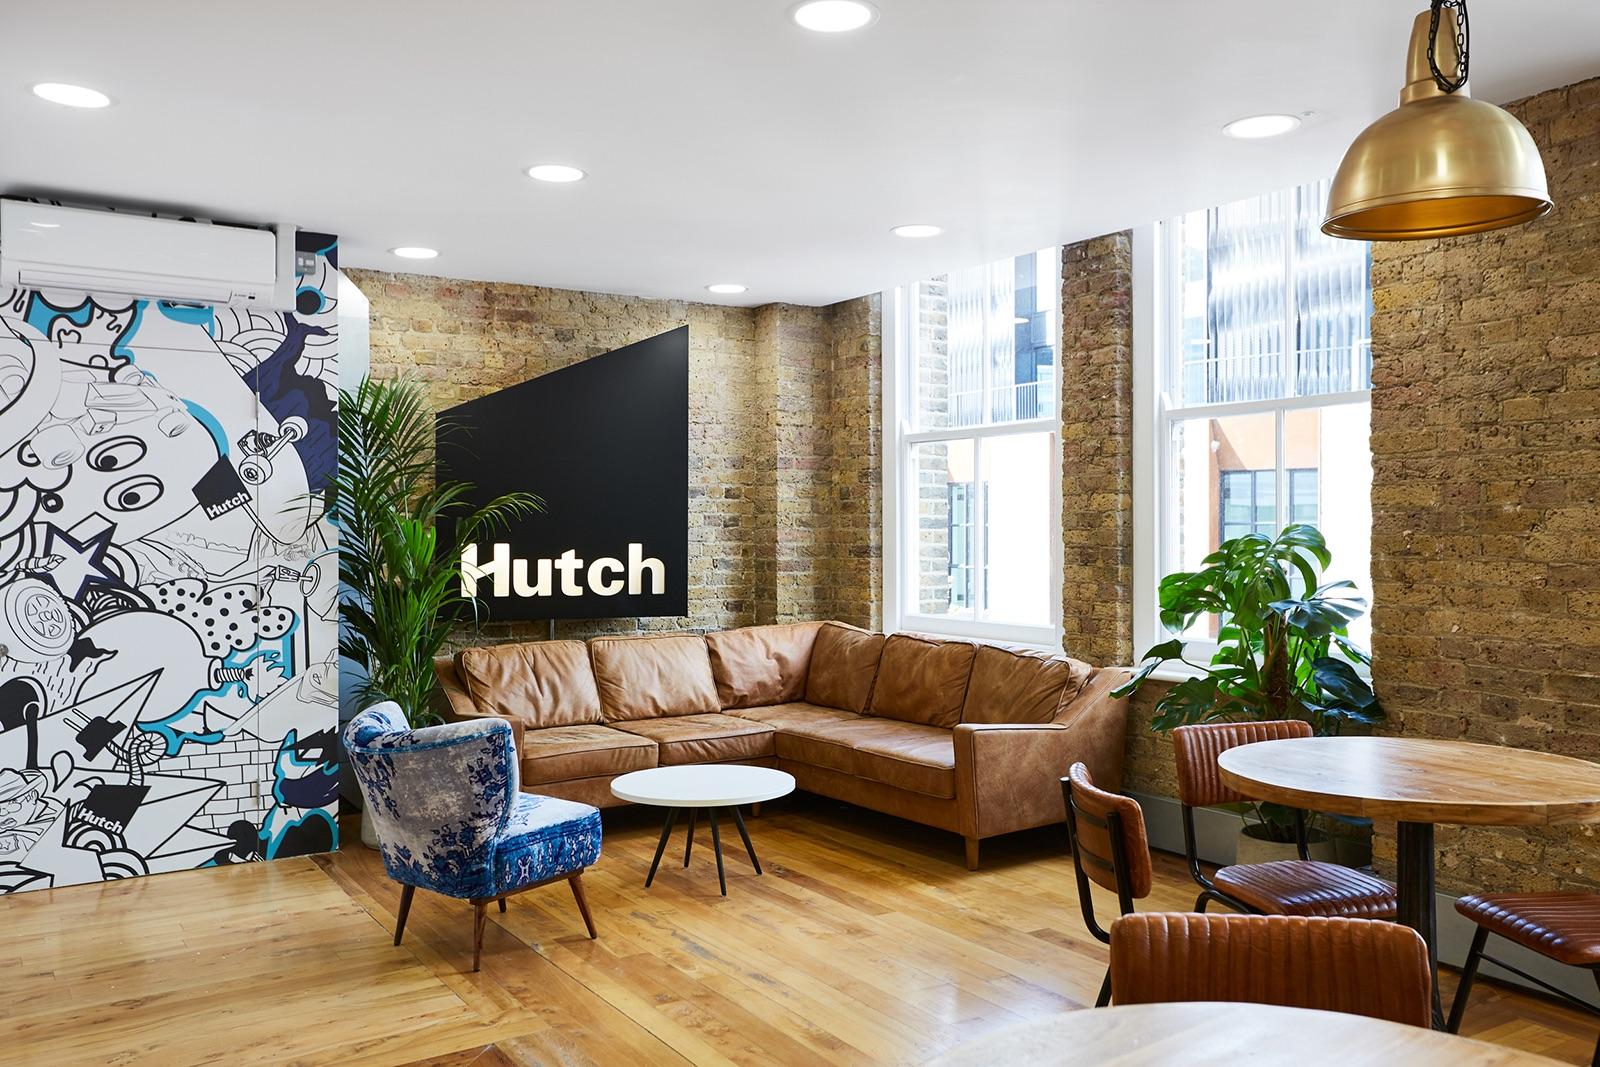 hutch-shoreditch-office-1